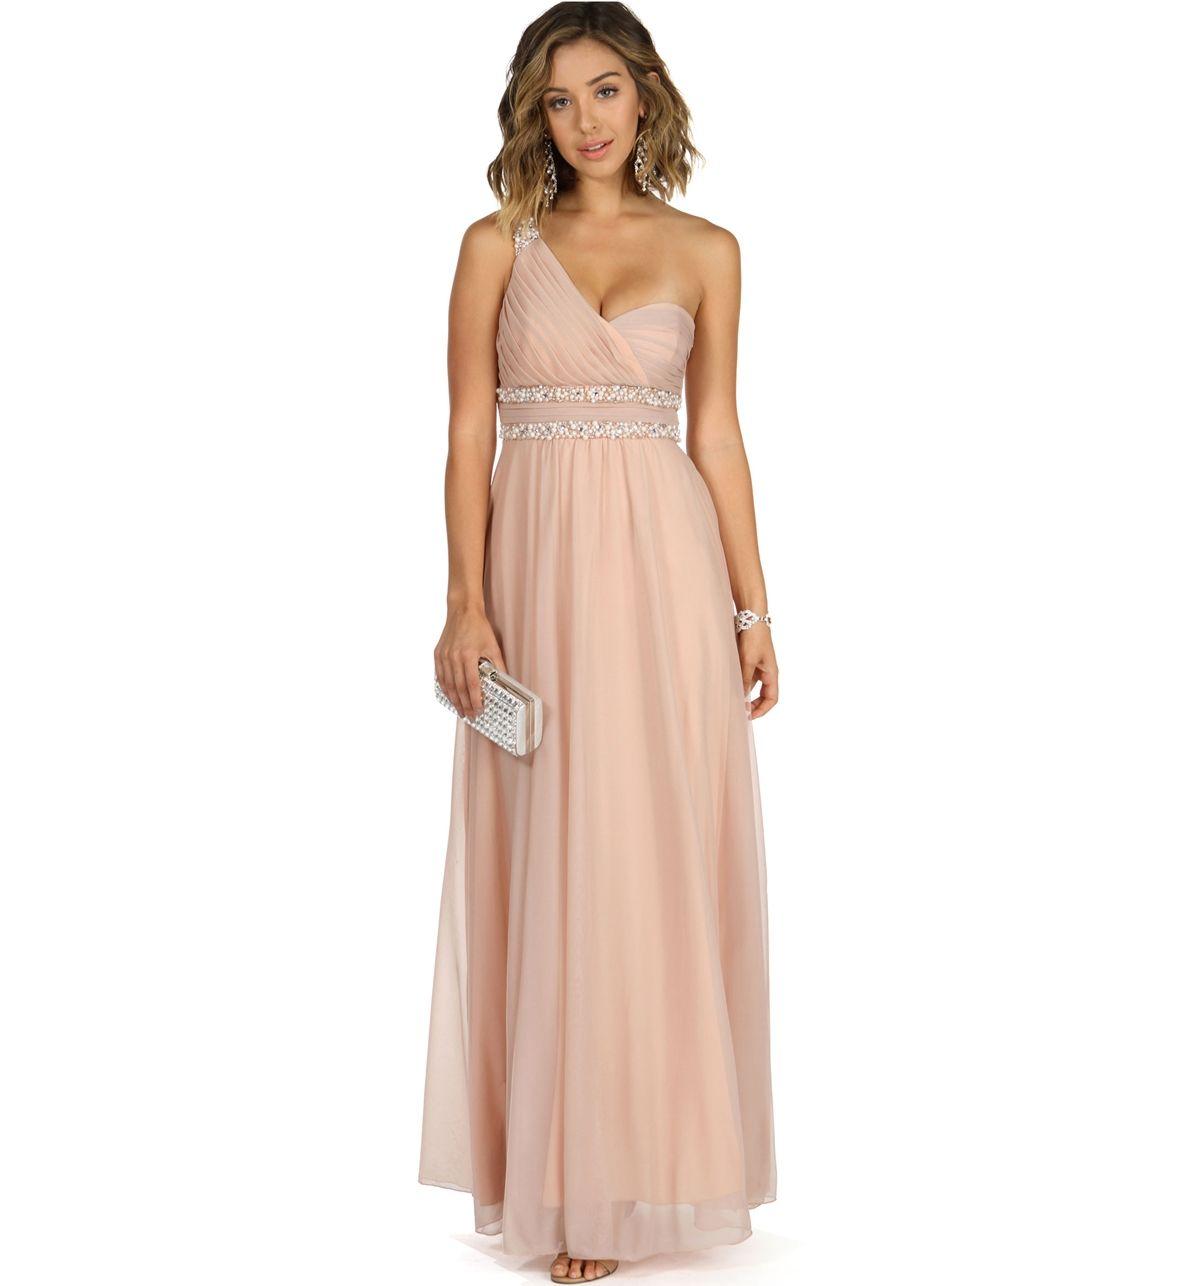 Heather-Mauve Prom Dress | Bridal showerz | Pinterest | Mauve and Prom